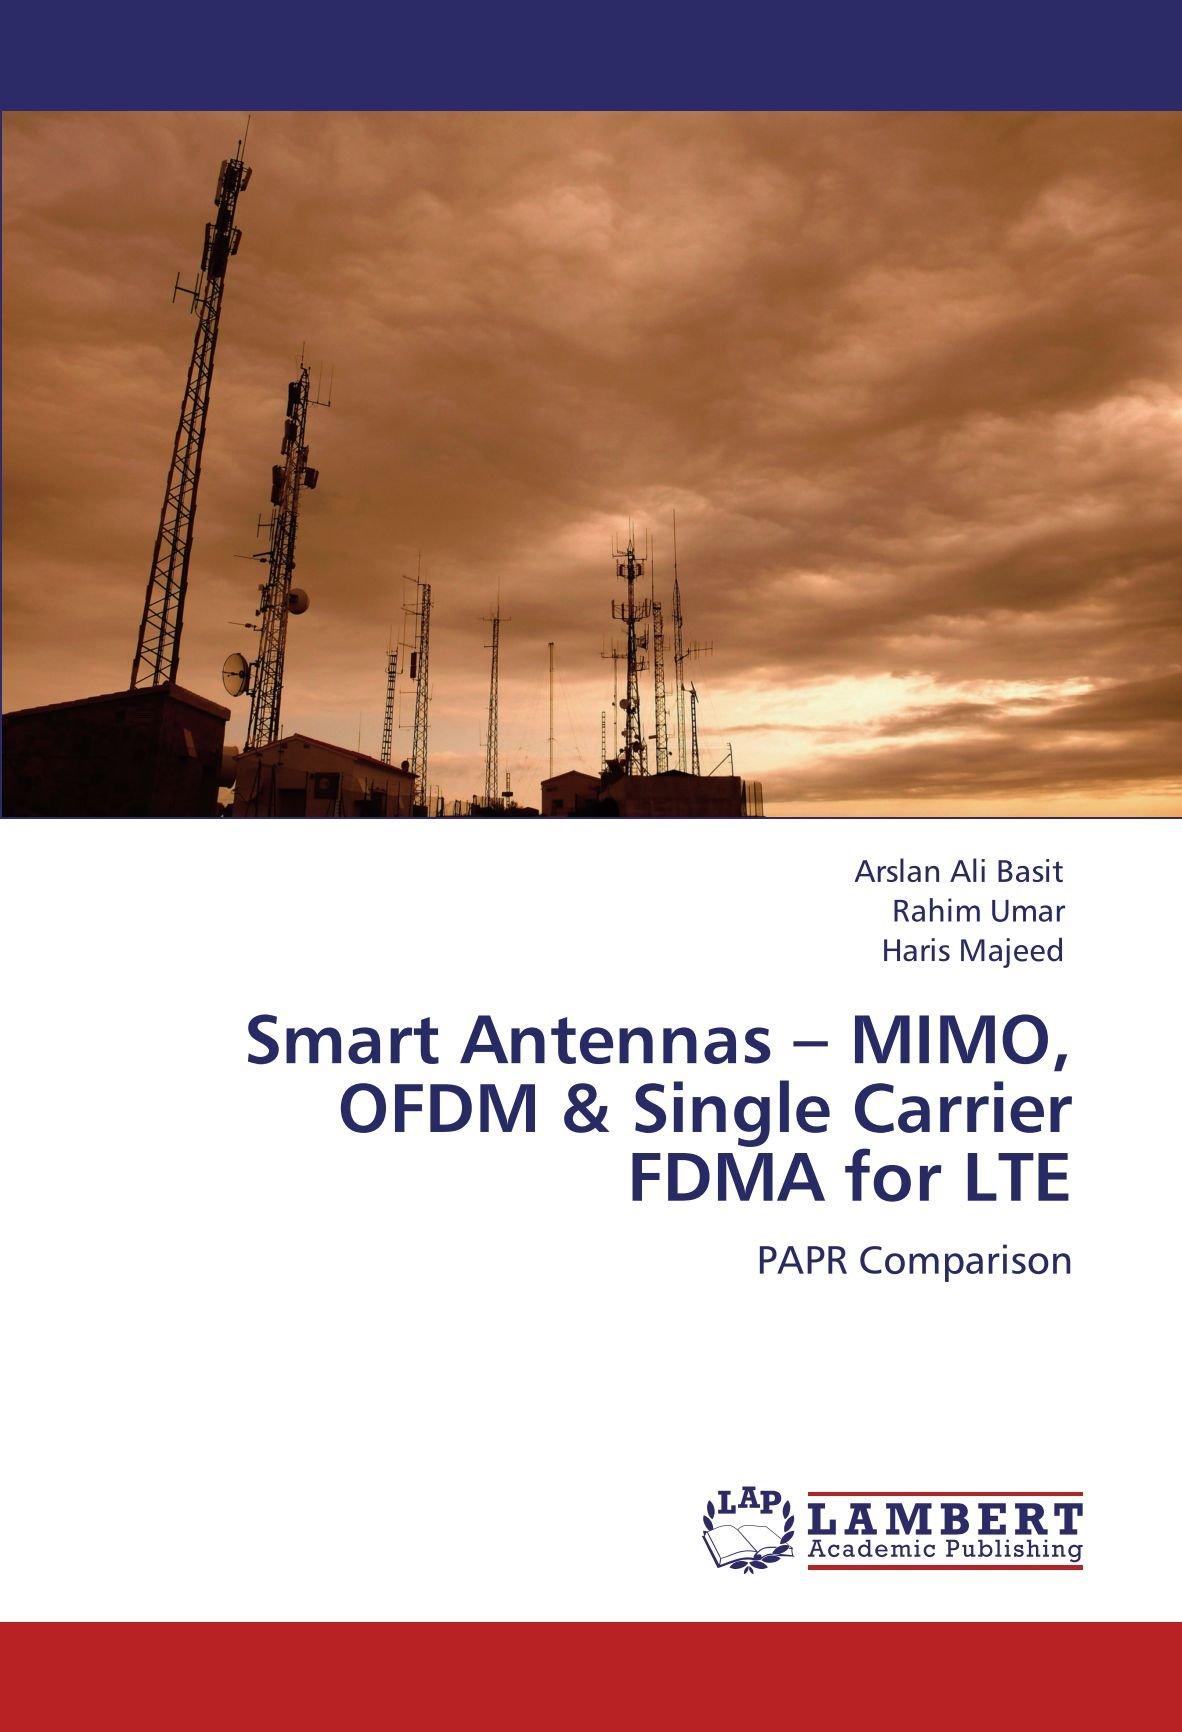 Smart Antennas Mimo Ofdm Single Carrier Fdma For Lte Papr Comparison Arslan Ali Basit Rahim Umar Haris Majeed 9783846553435 Books